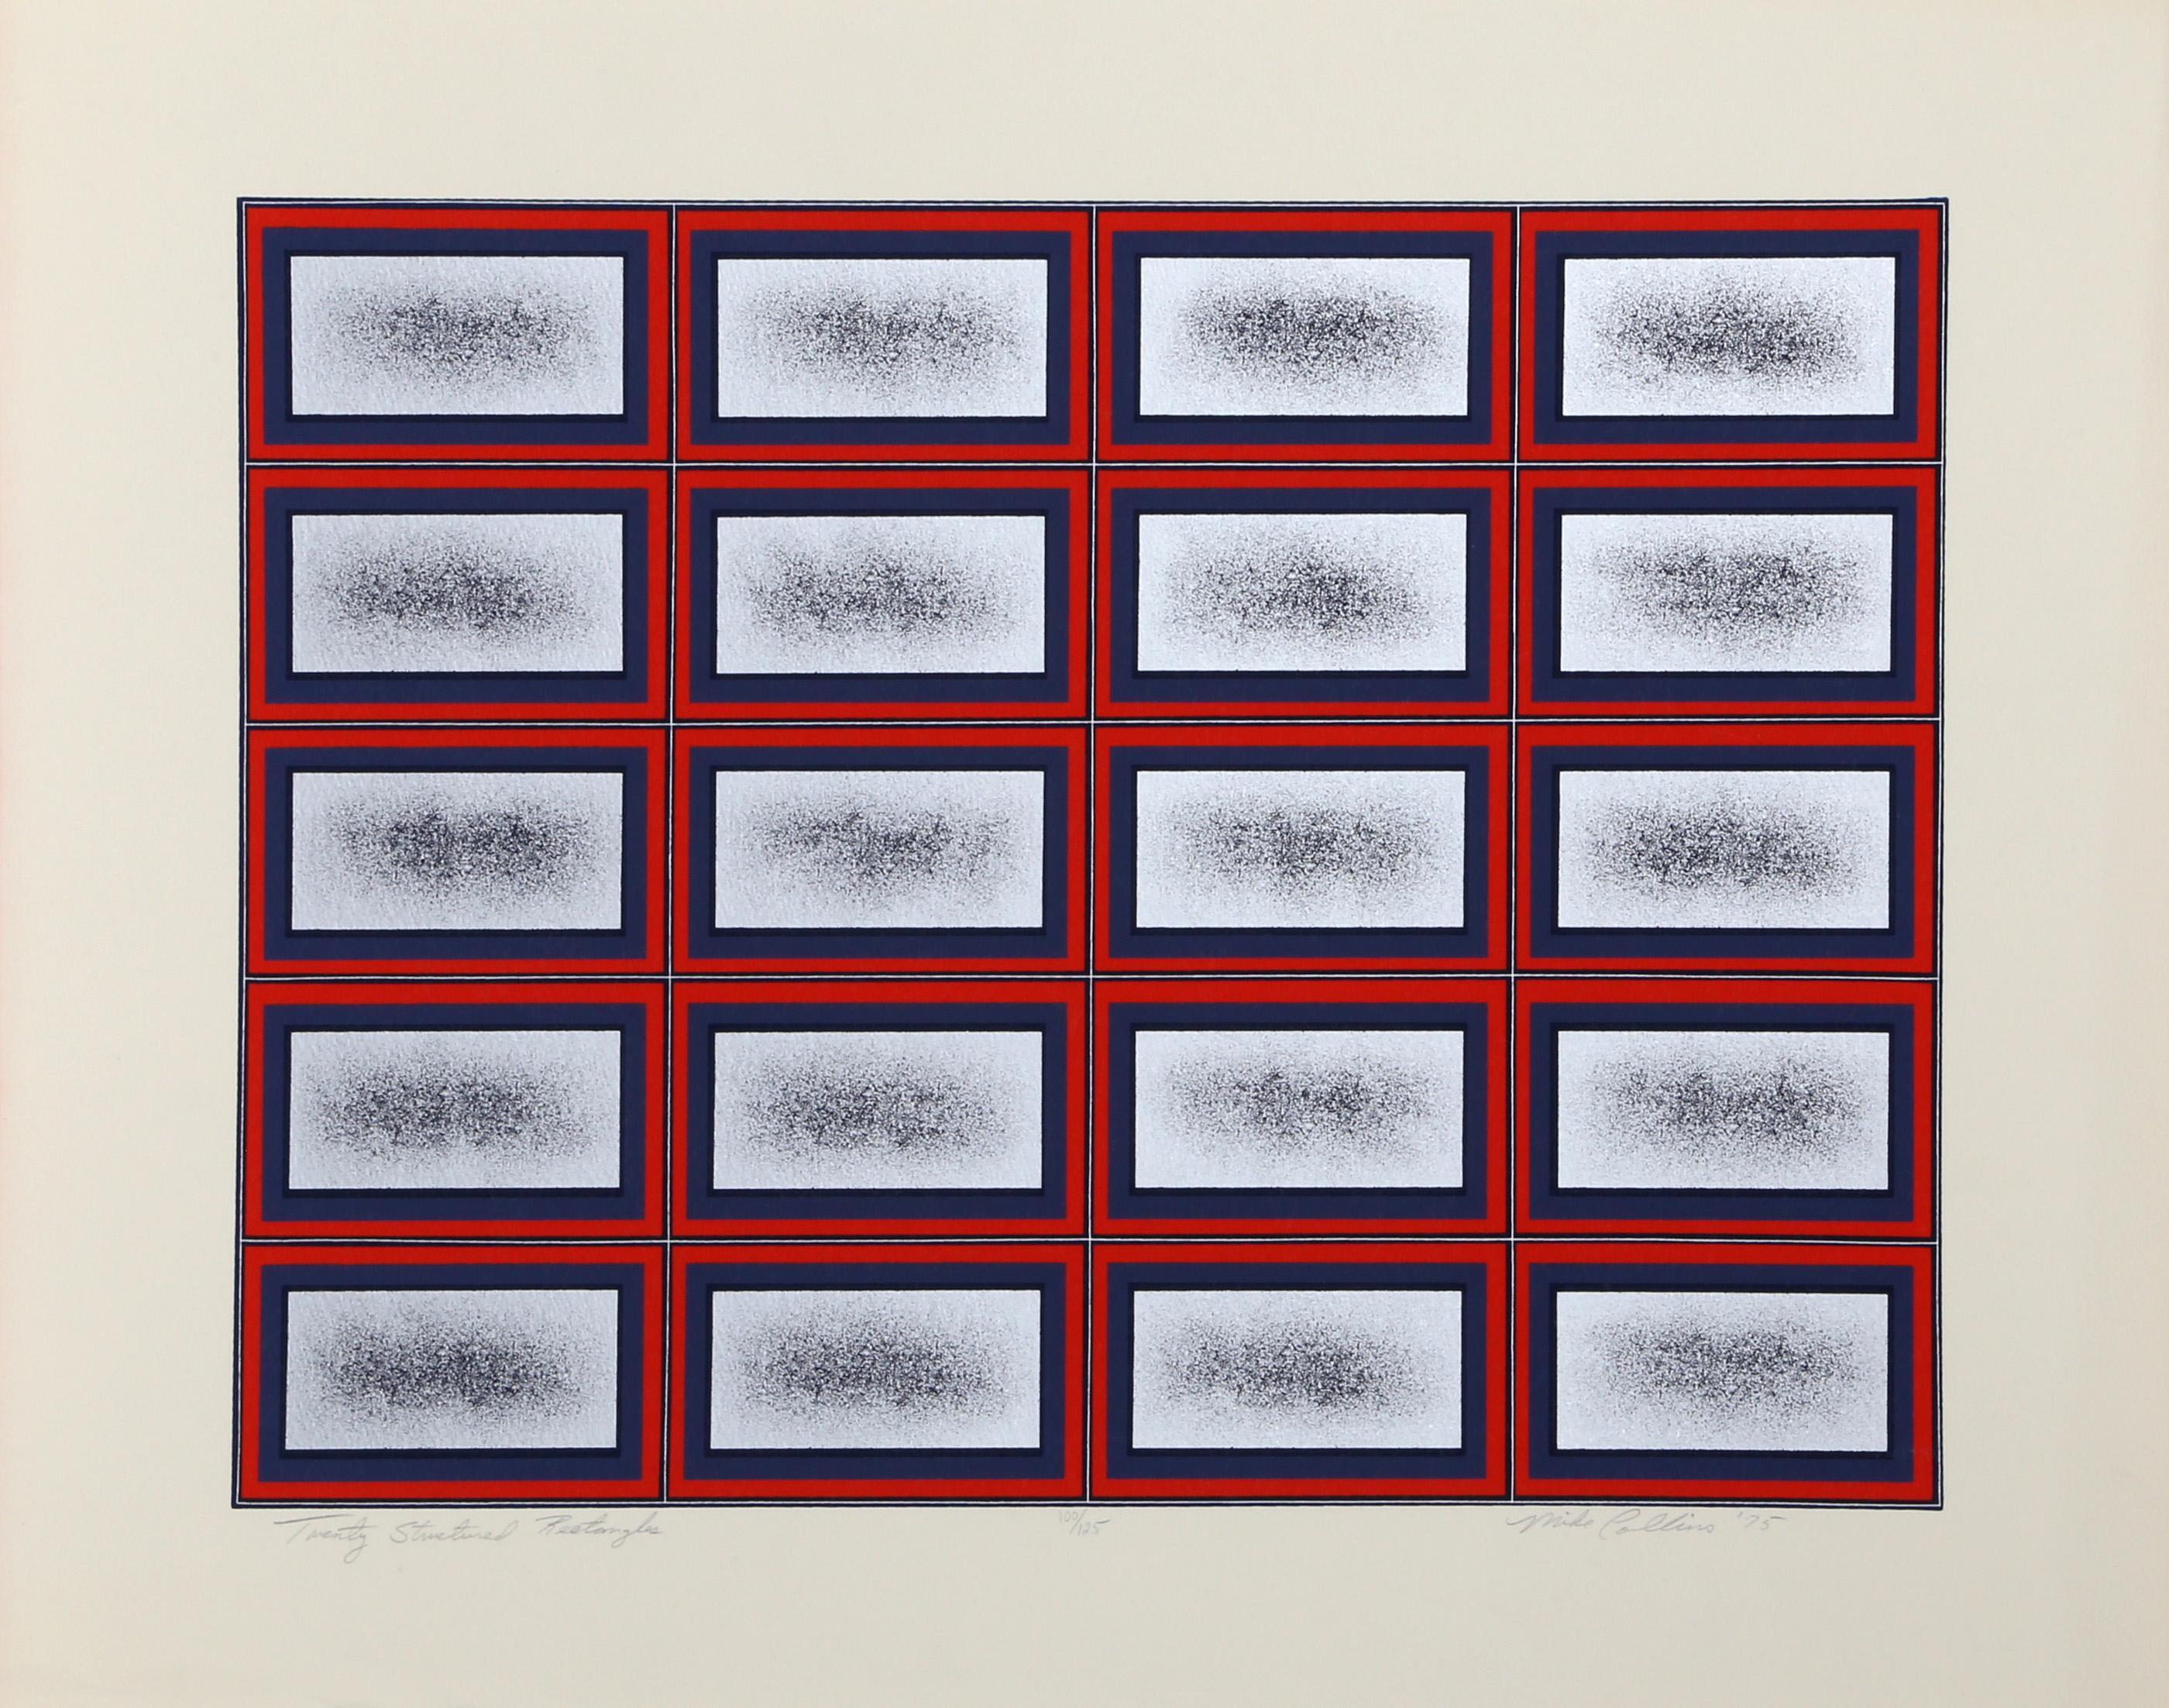 Mike Collins, Twenty Structured Rectangles, Screenprint